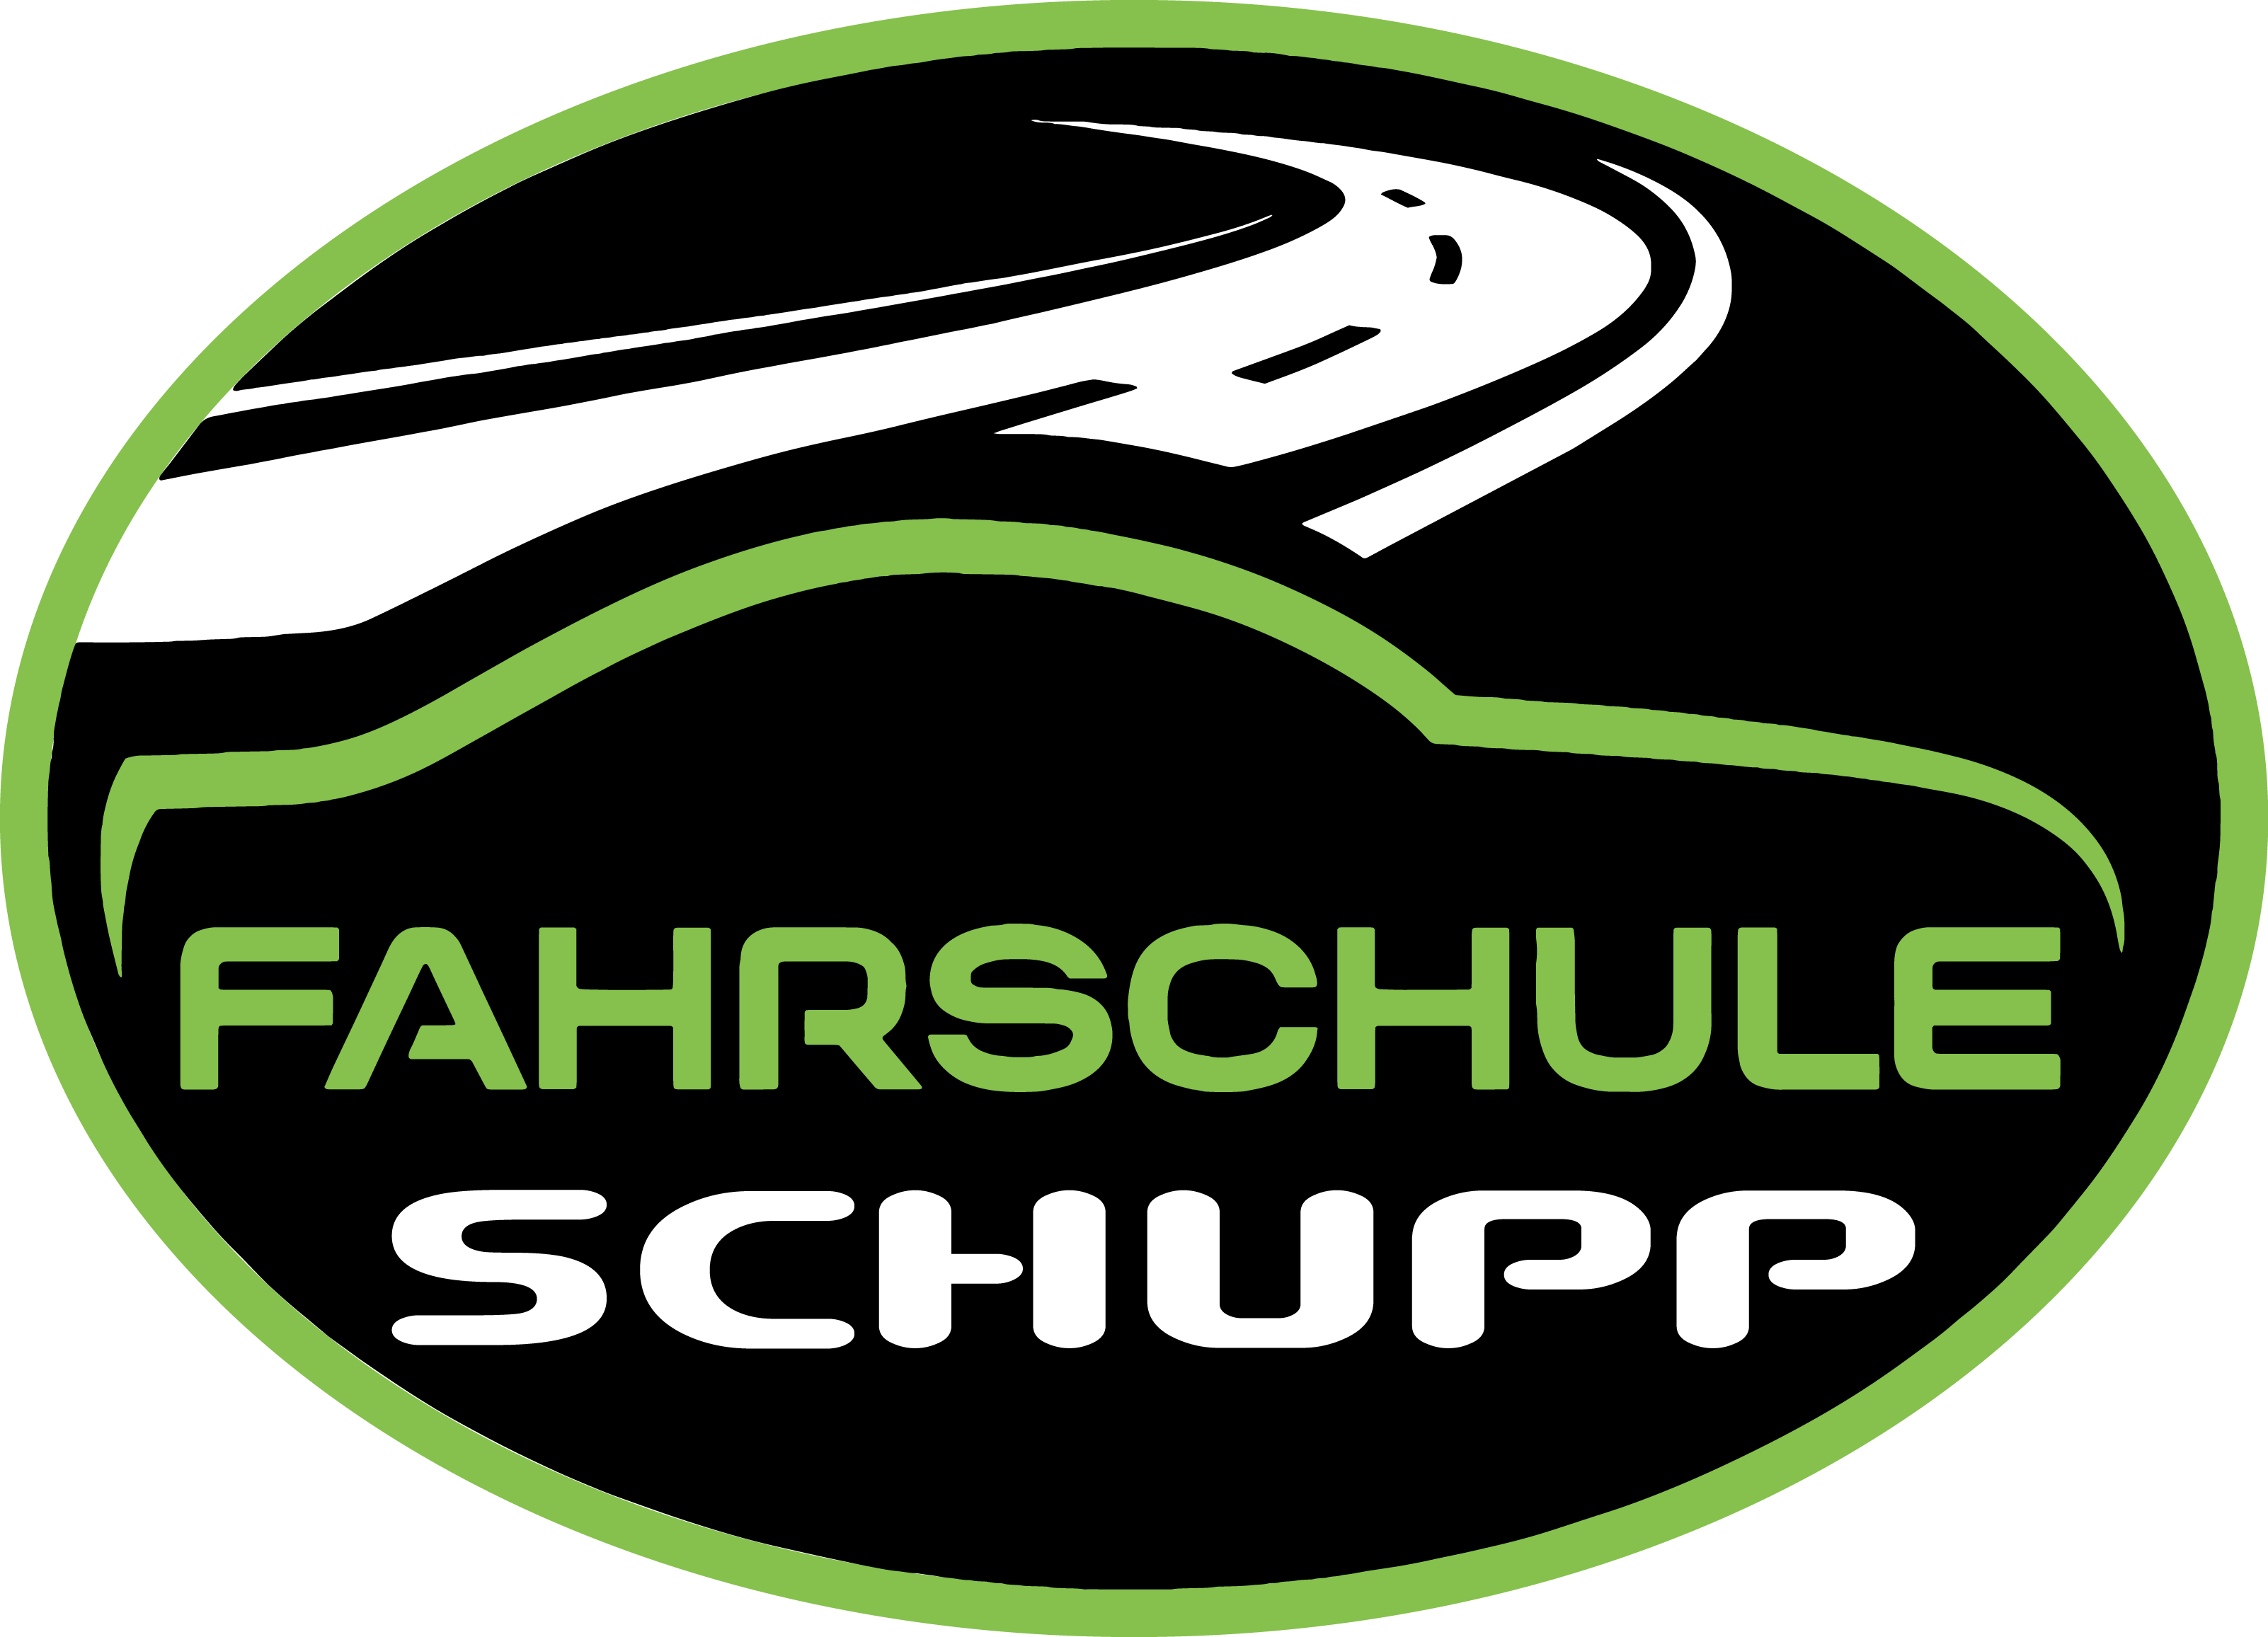 Fahrschule Schupp